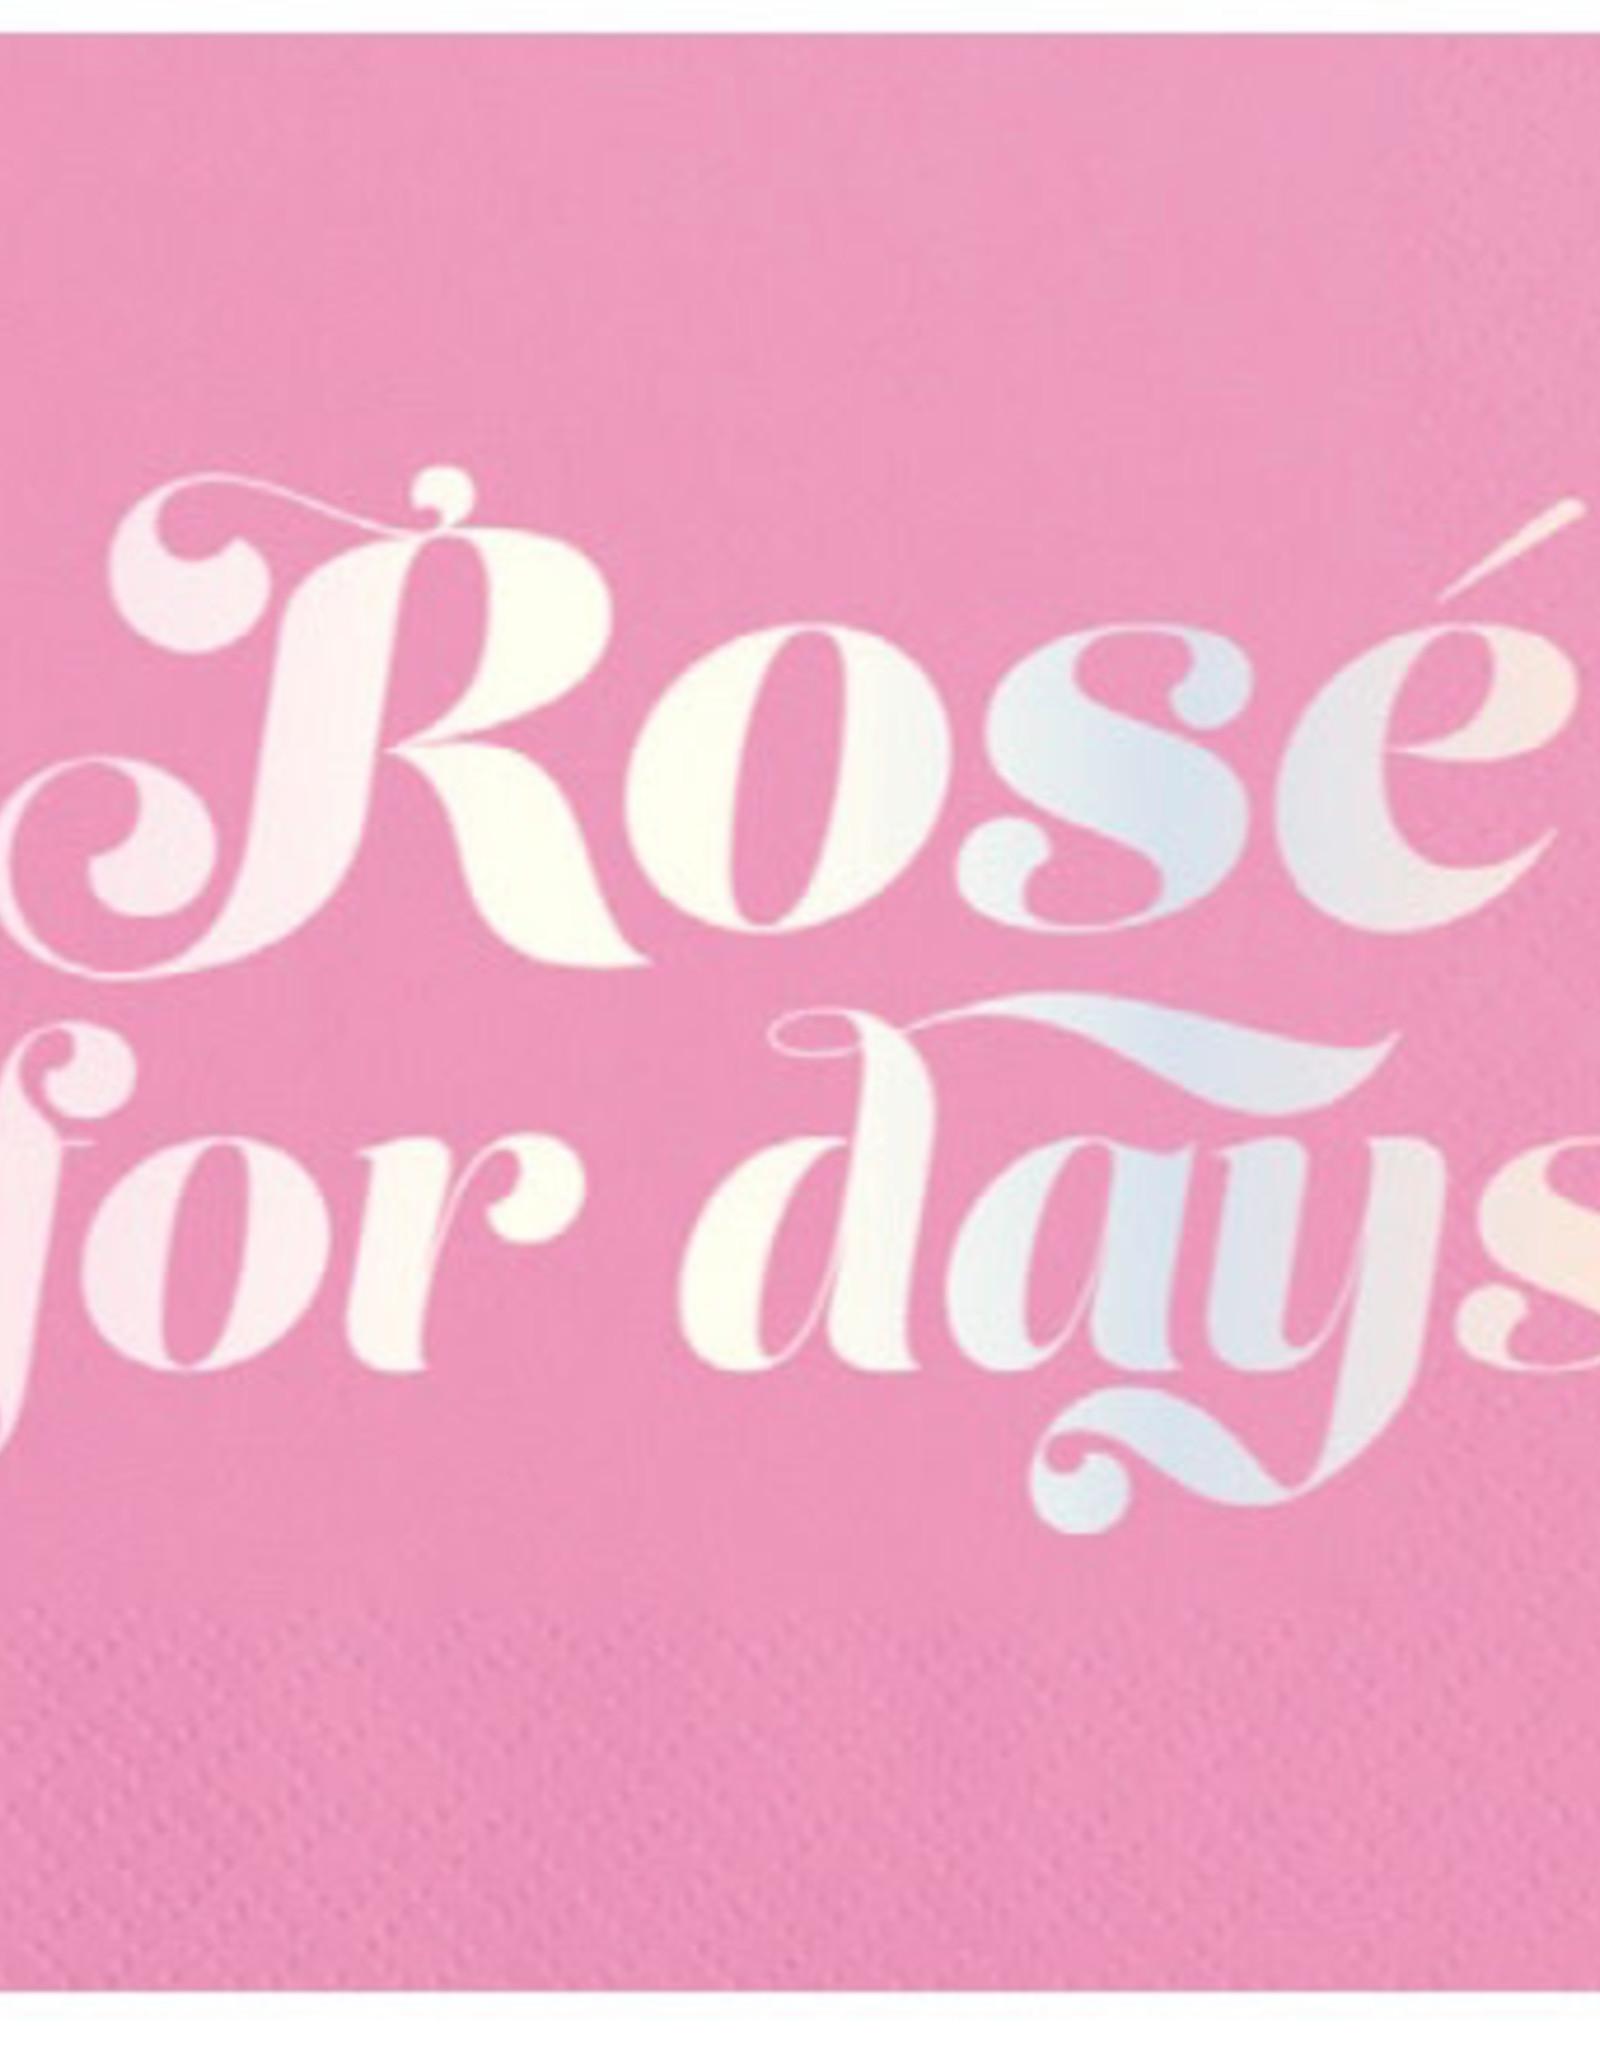 Rose for Days Napkins